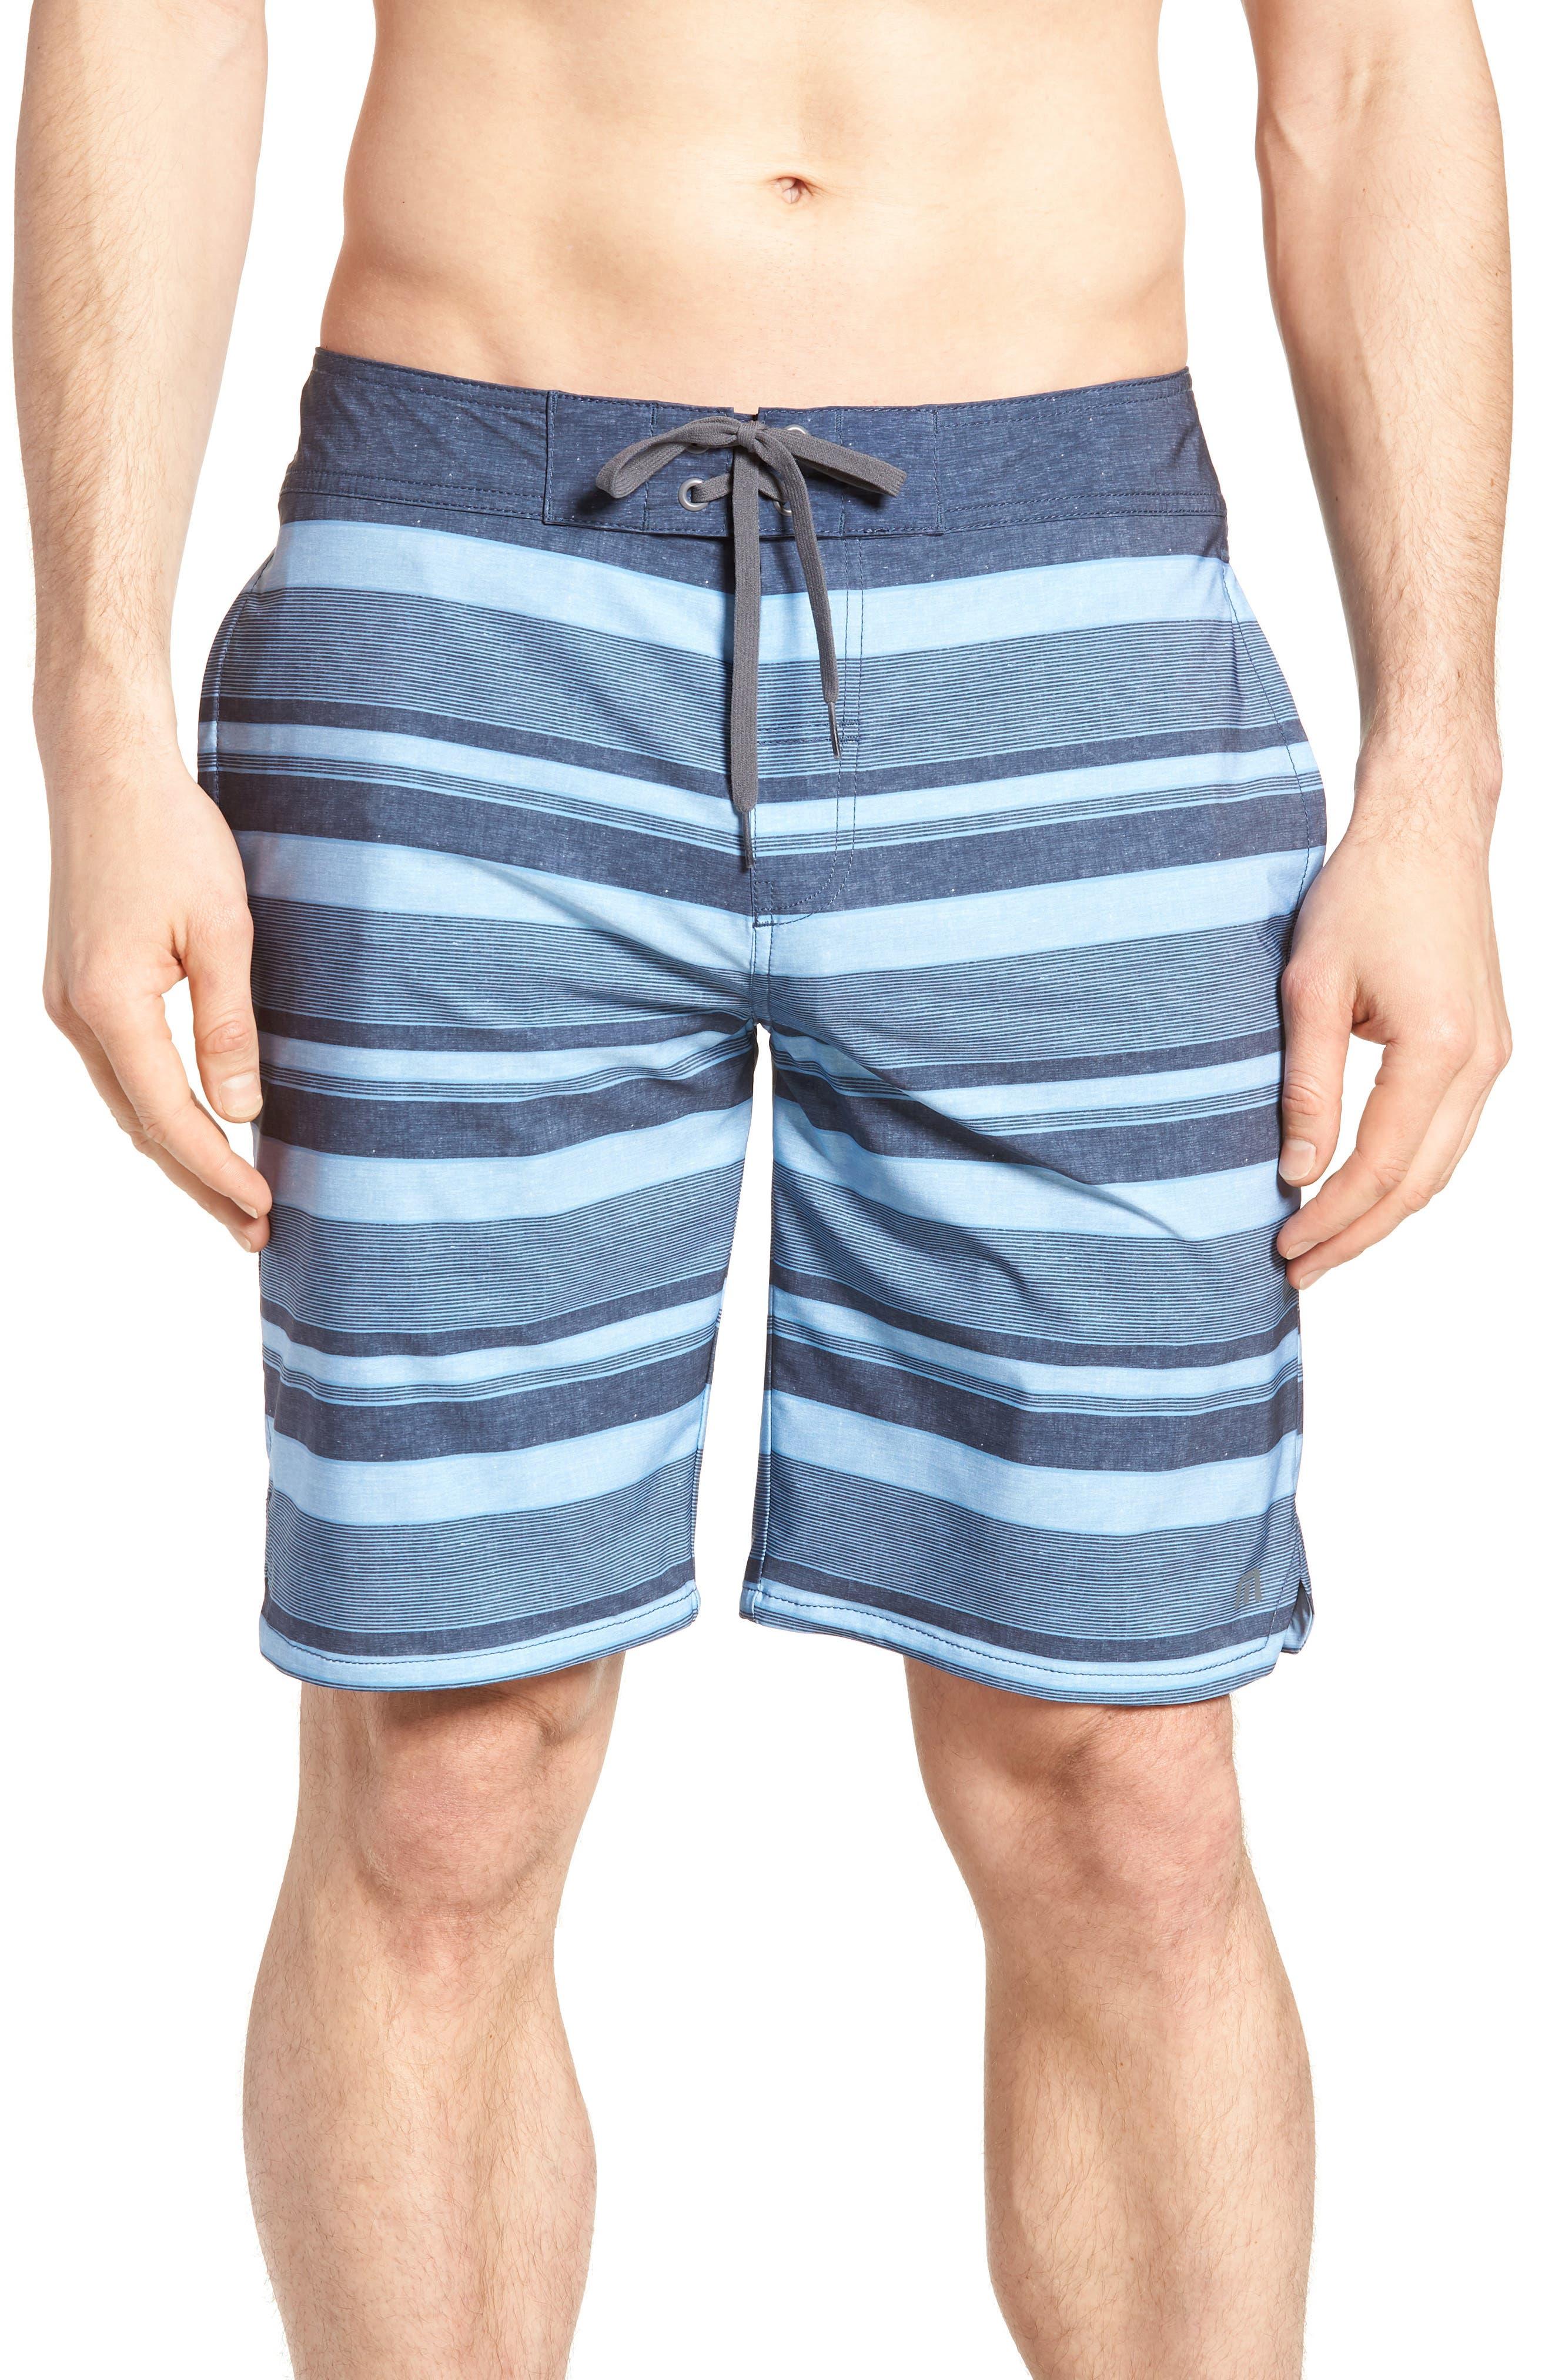 Colinas Regular Fit Board Shorts,                             Main thumbnail 1, color,                             HEATHER BLUESTONE